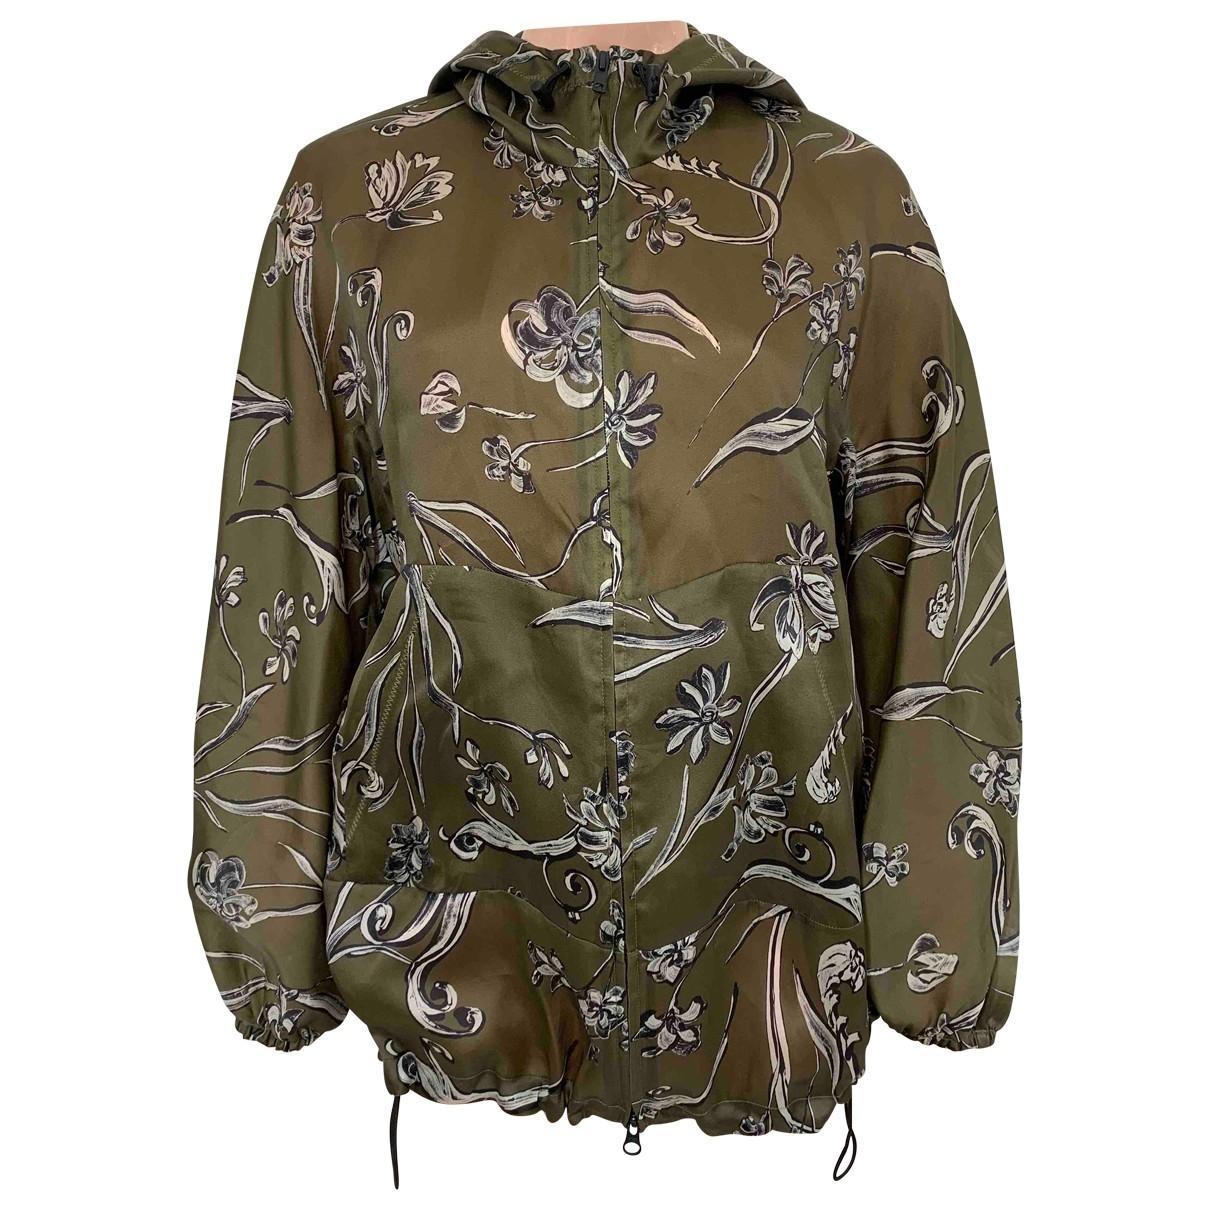 3.1 Phillip Lim \N Khaki Silk jacket for Women 0 0-5